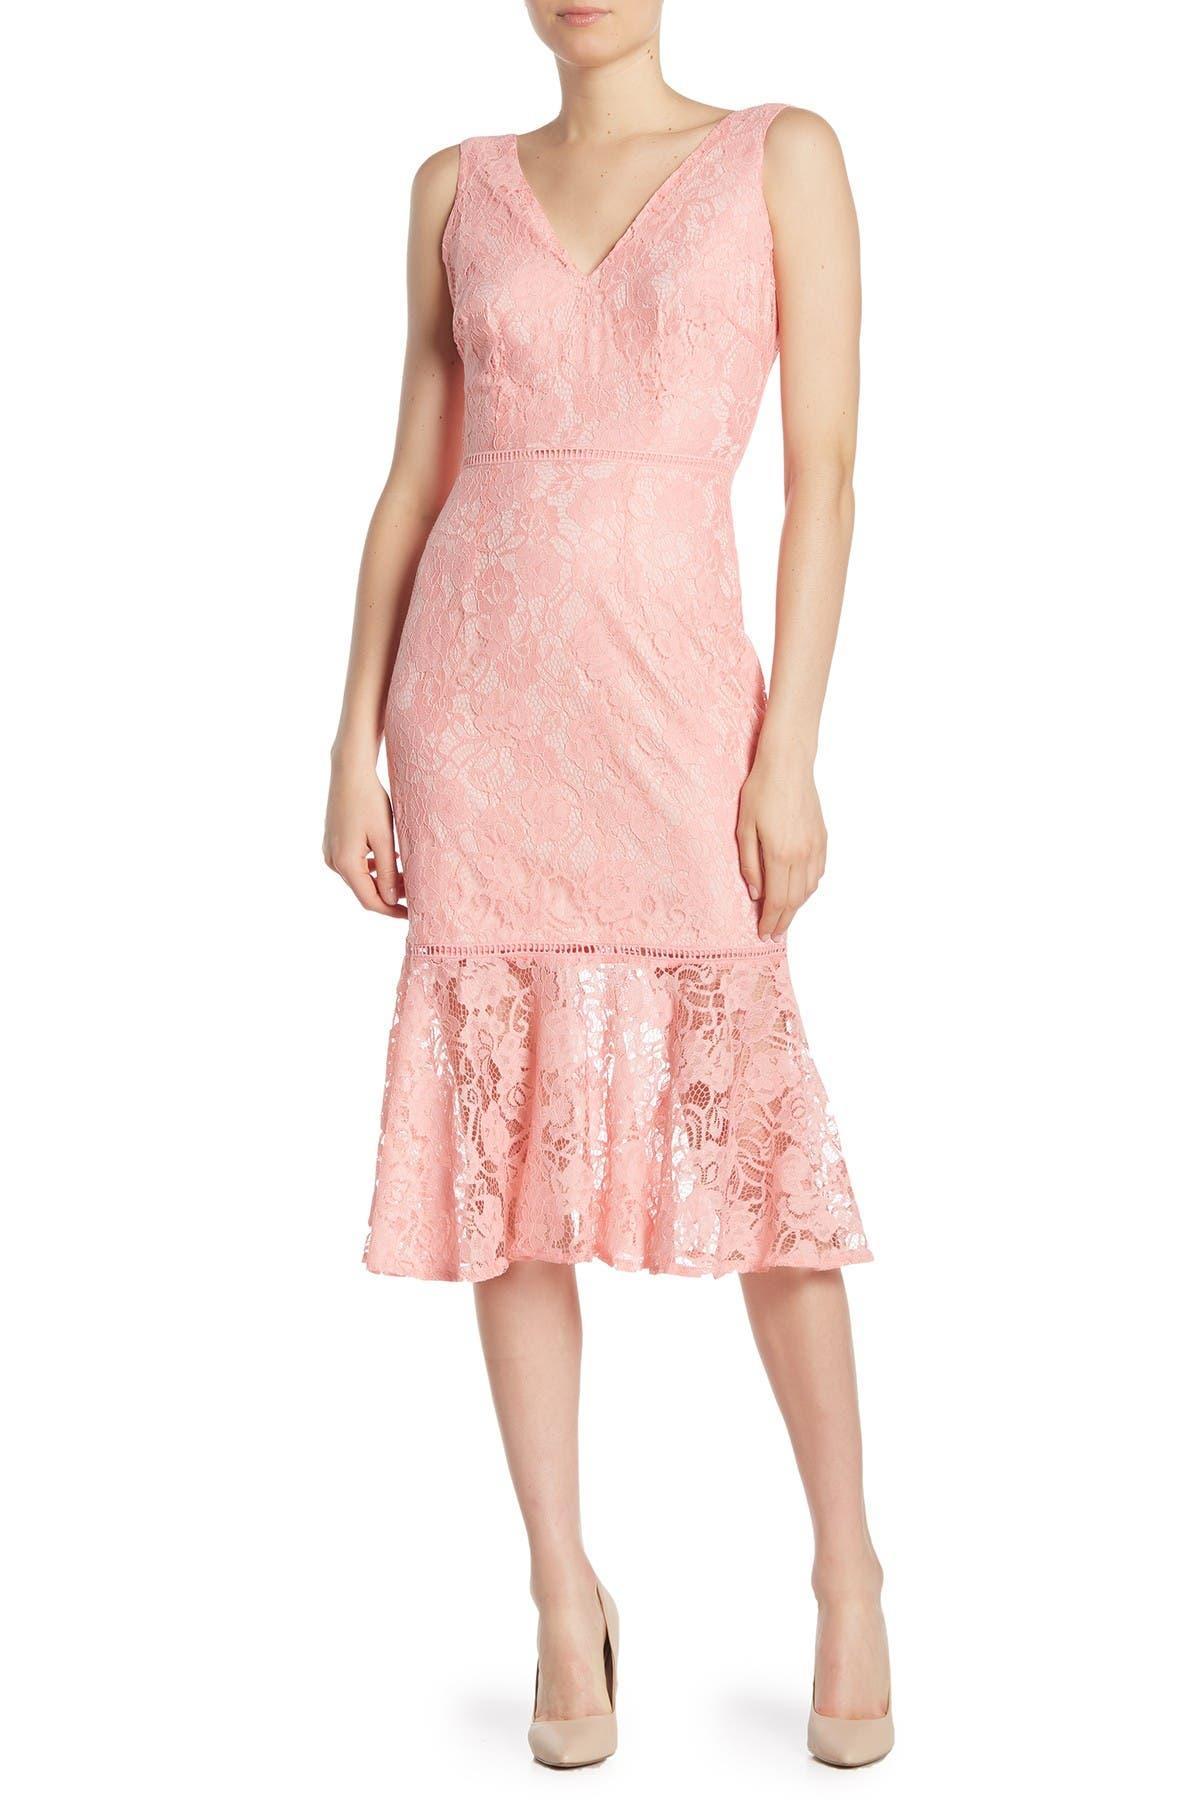 Image of Alexia Admor Kourtney Lace Midi Dress